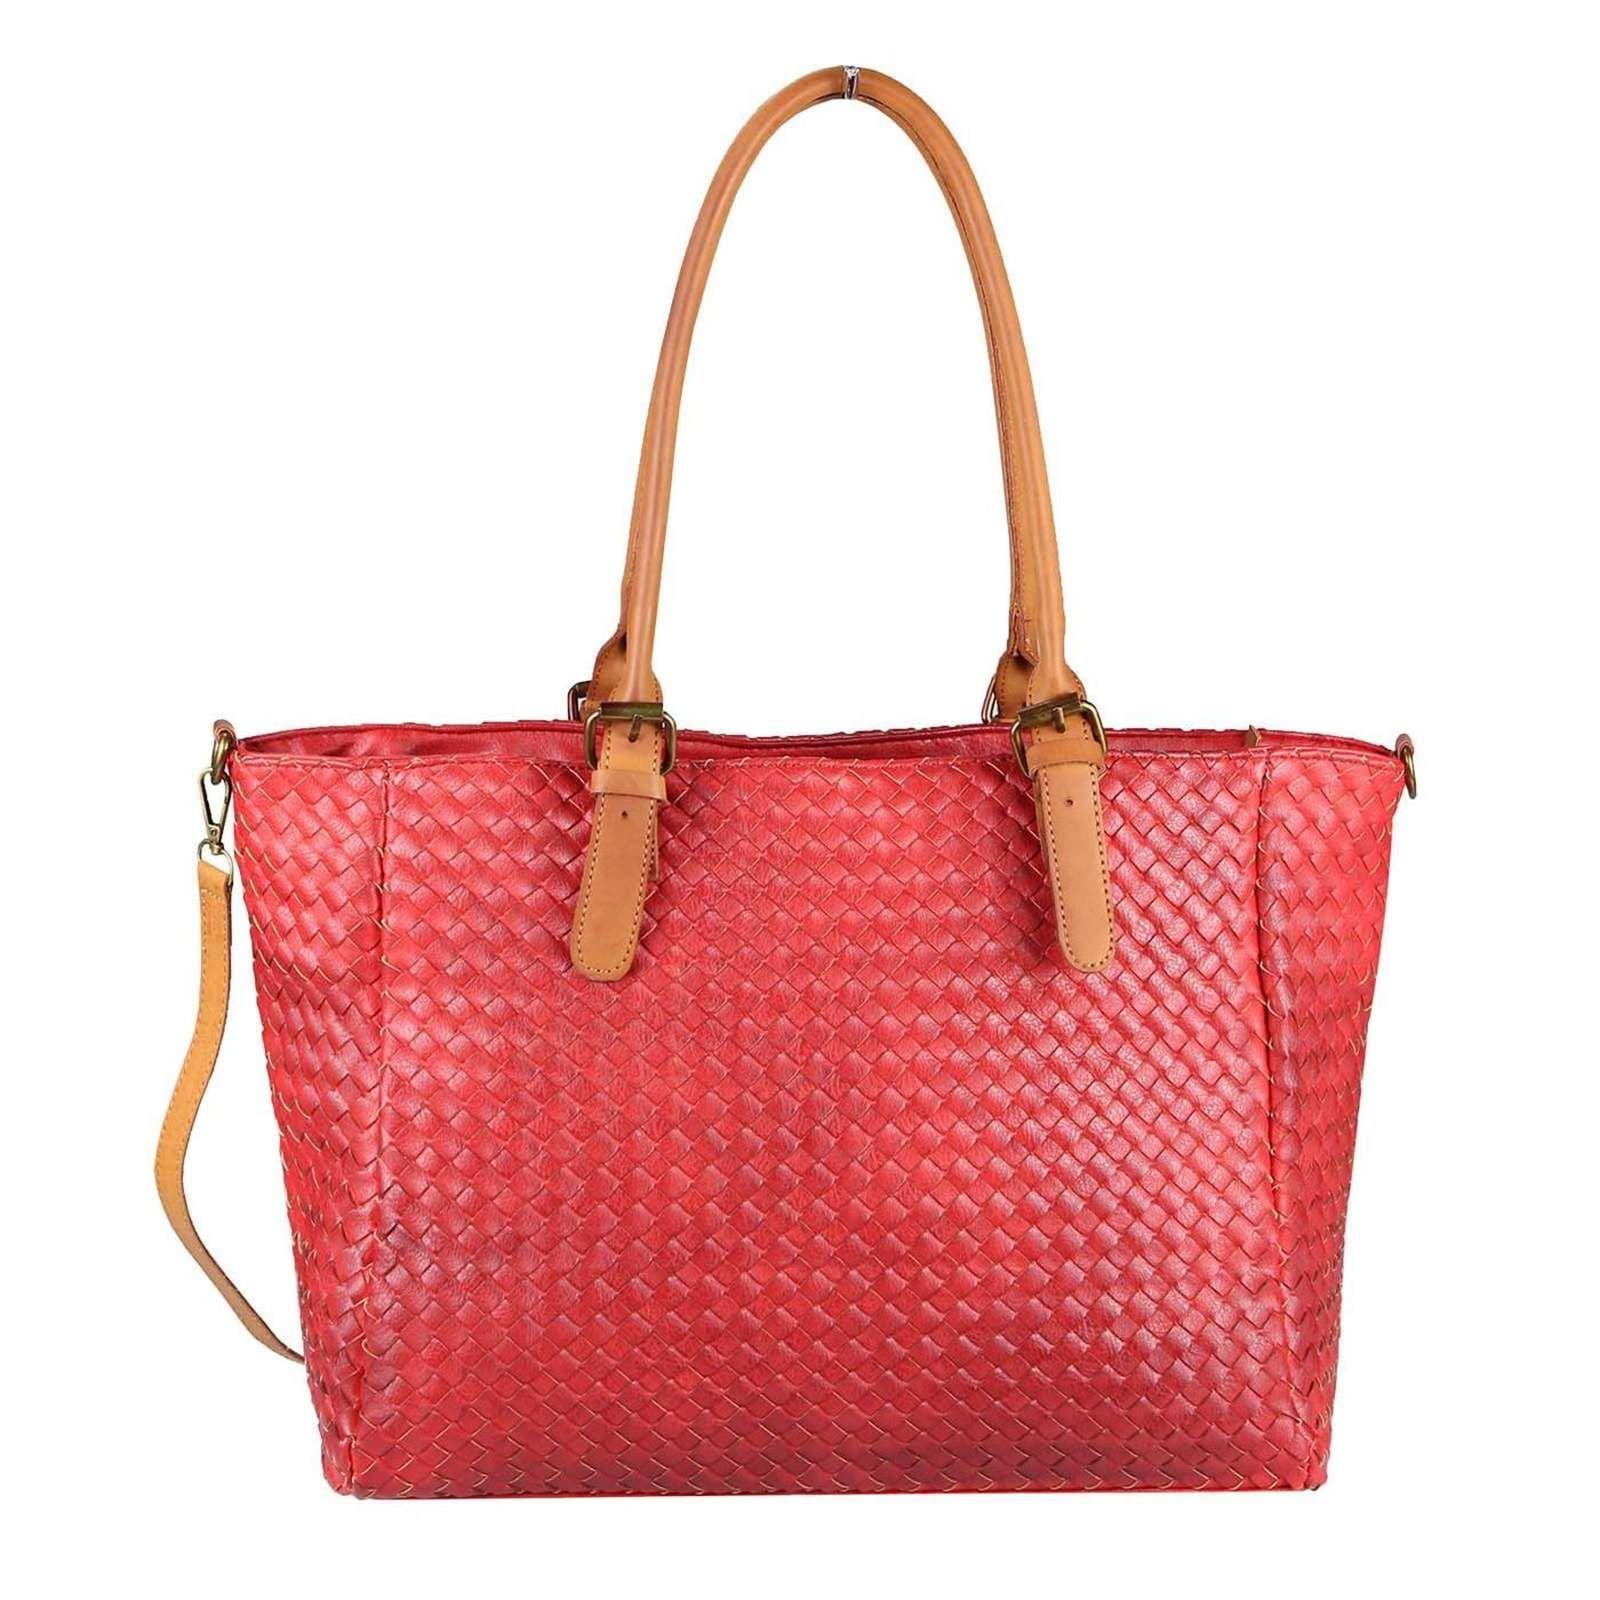 Shopper Flecht Tasche Tote Bag Henkeltasche Damen Handtasche dxroCBWQeE